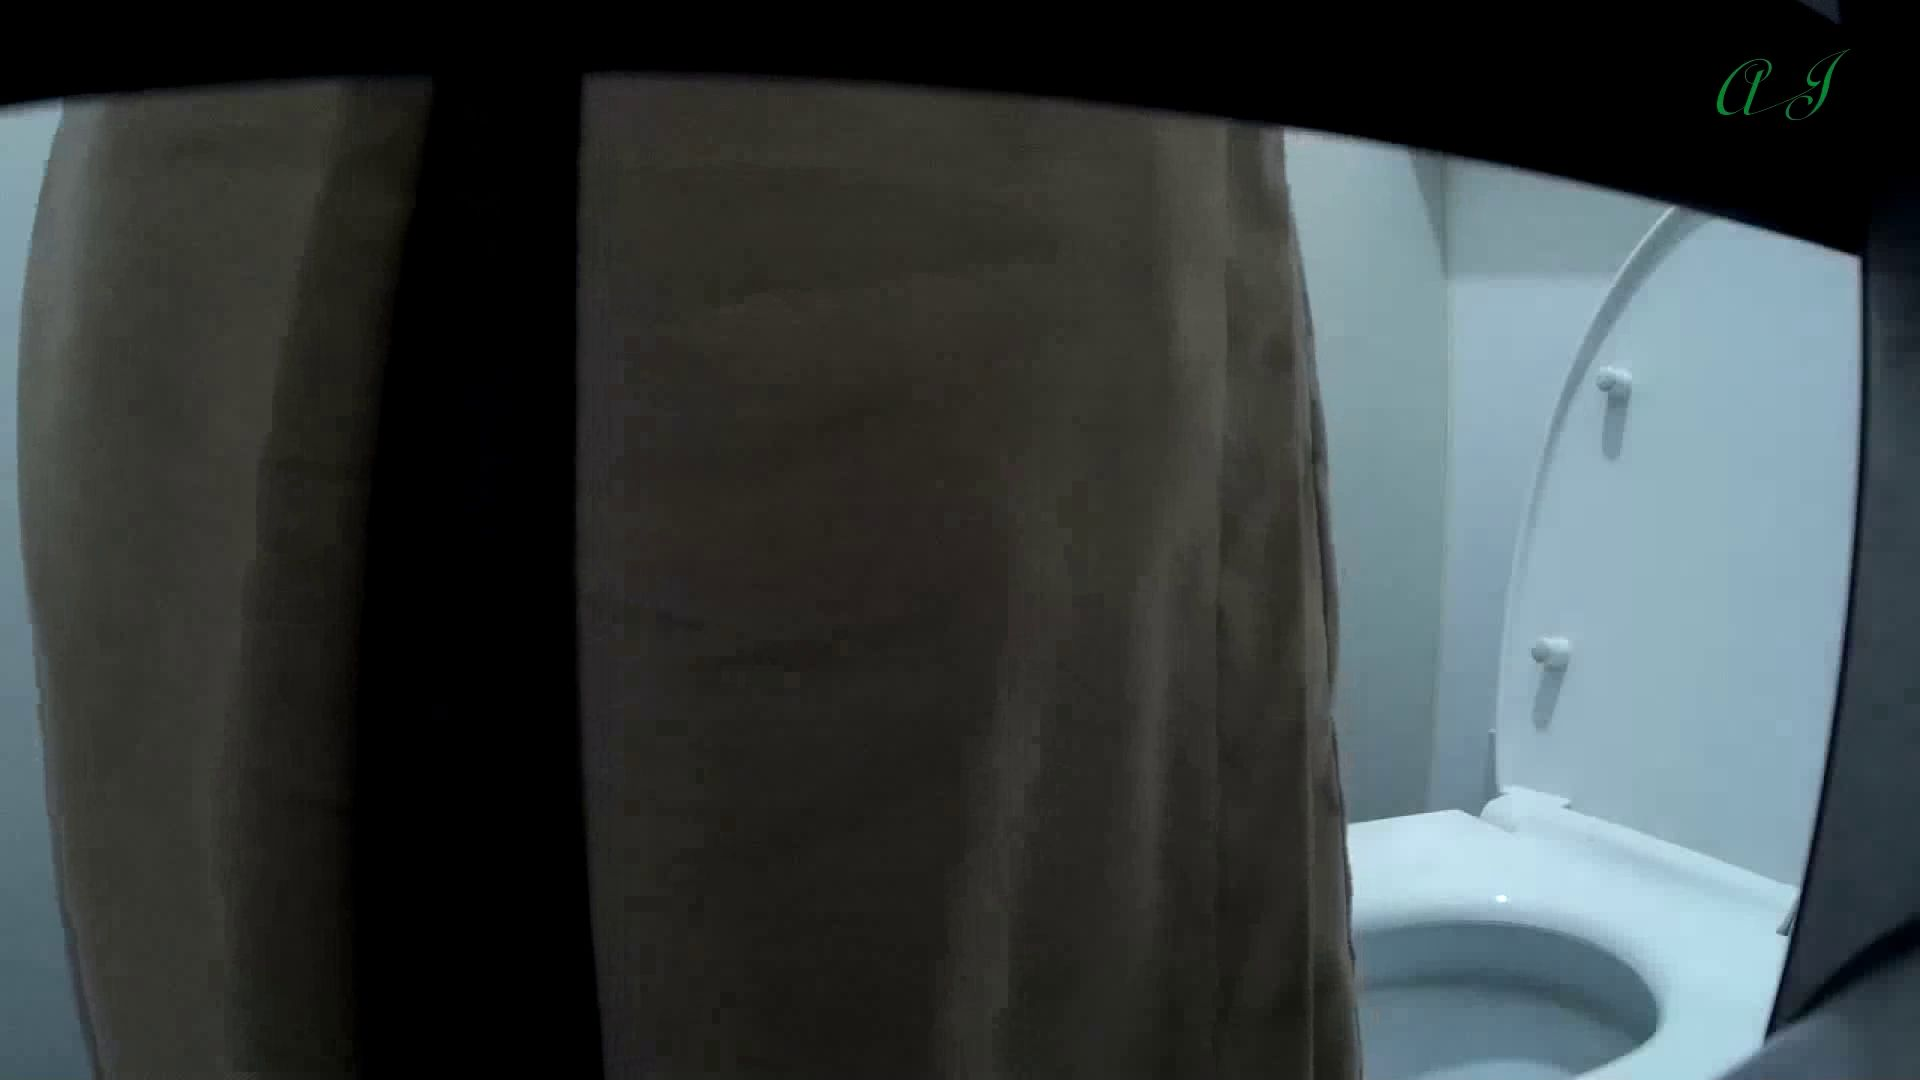 有名大学女性洗面所 vol.62 会話が弾む化粧室!! 丸見え ワレメ無修正動画無料 55画像 42